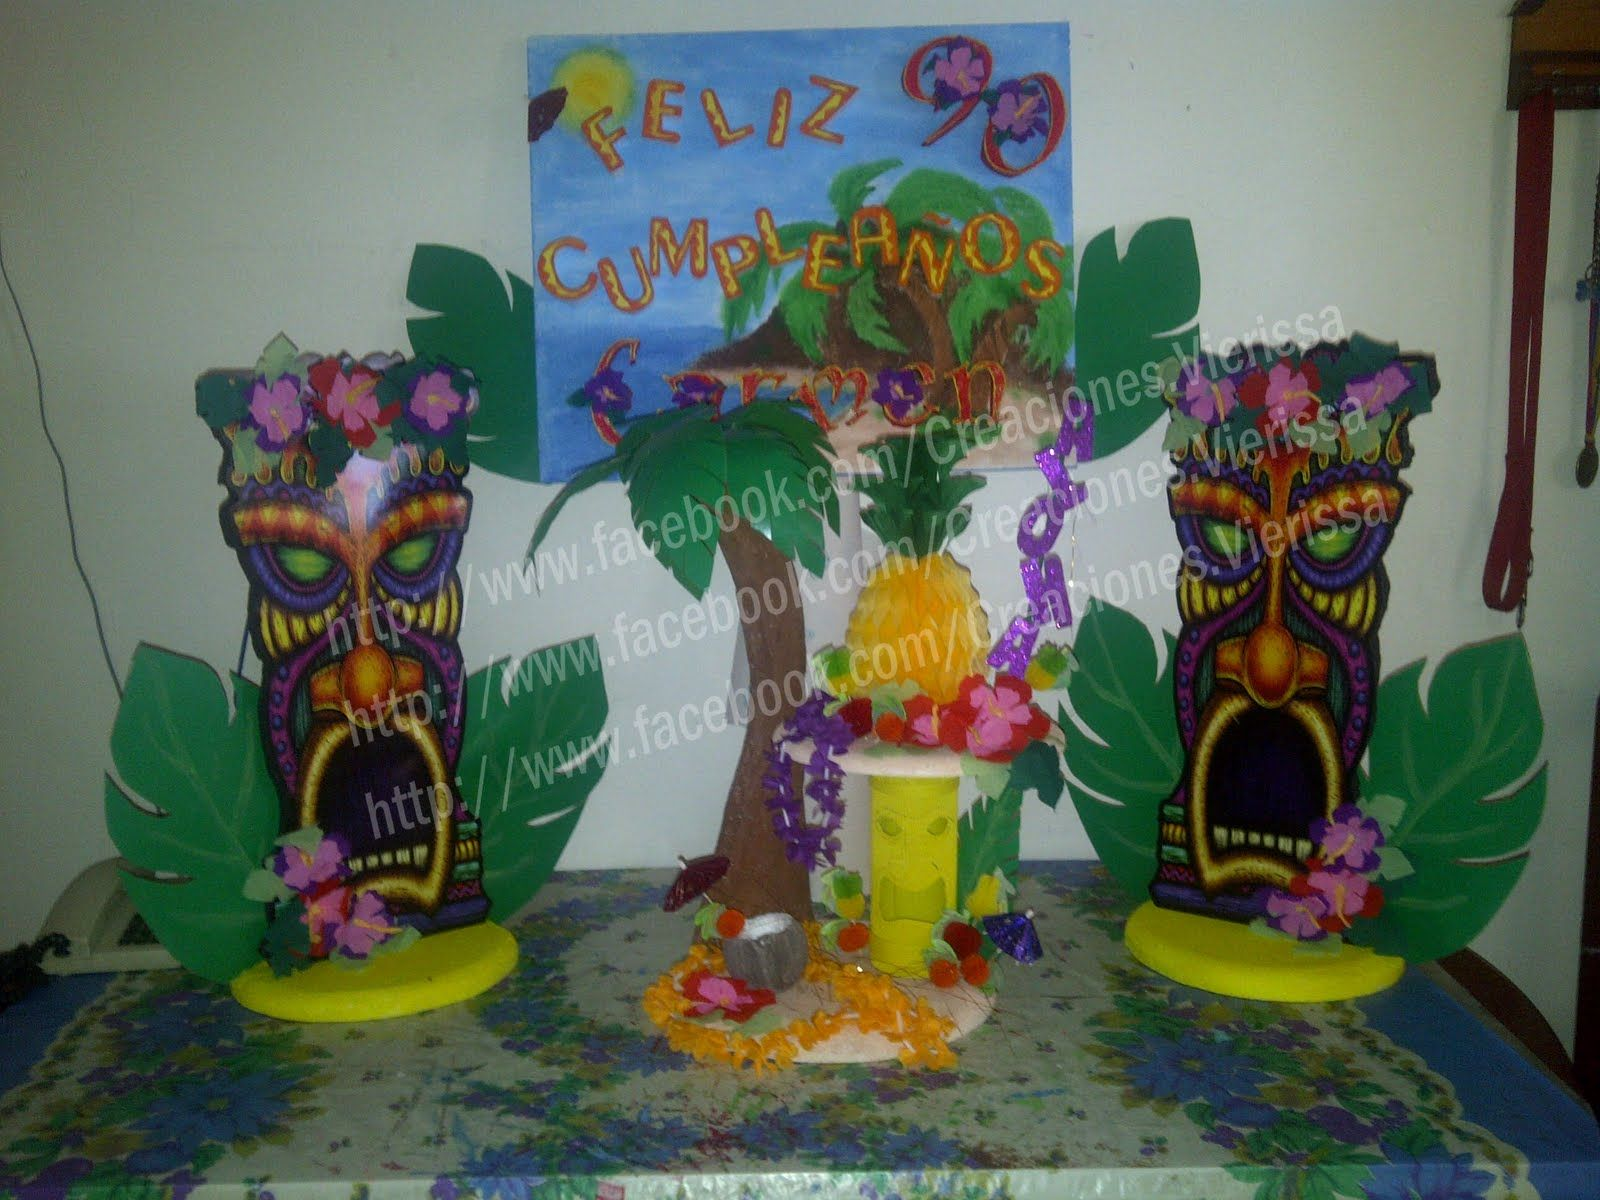 Decoracion fiesta hawaiana en piscina buscar con google totem pinterest totems - Fiesta hawaiana ideas decoracion ...